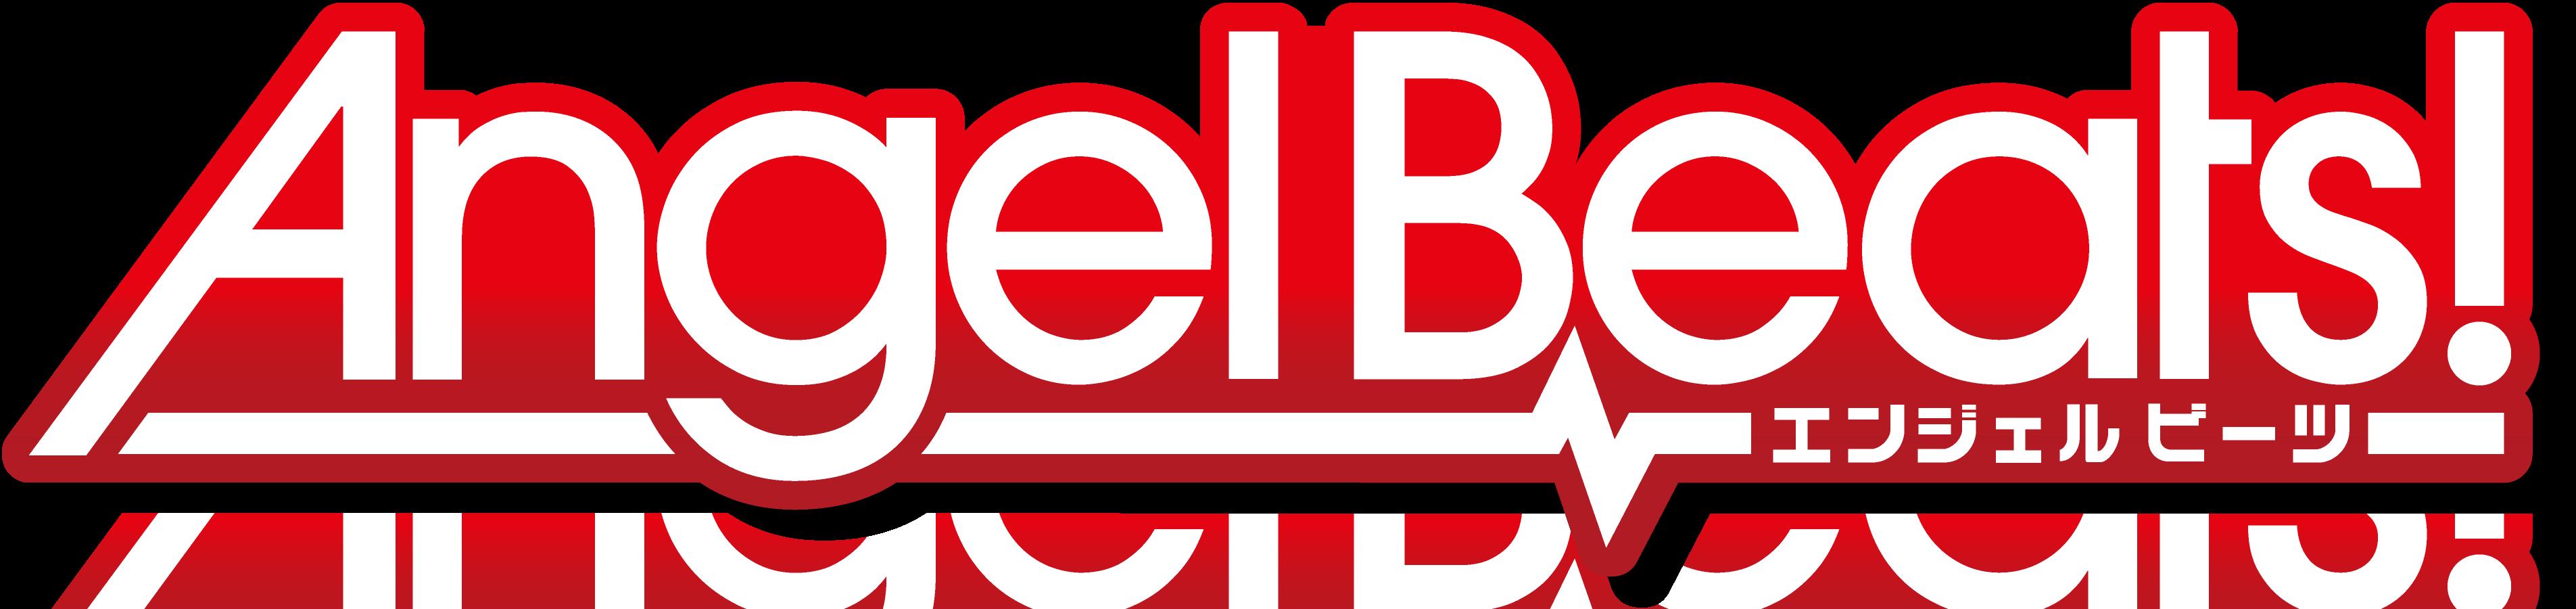 Angel Beats! Logo